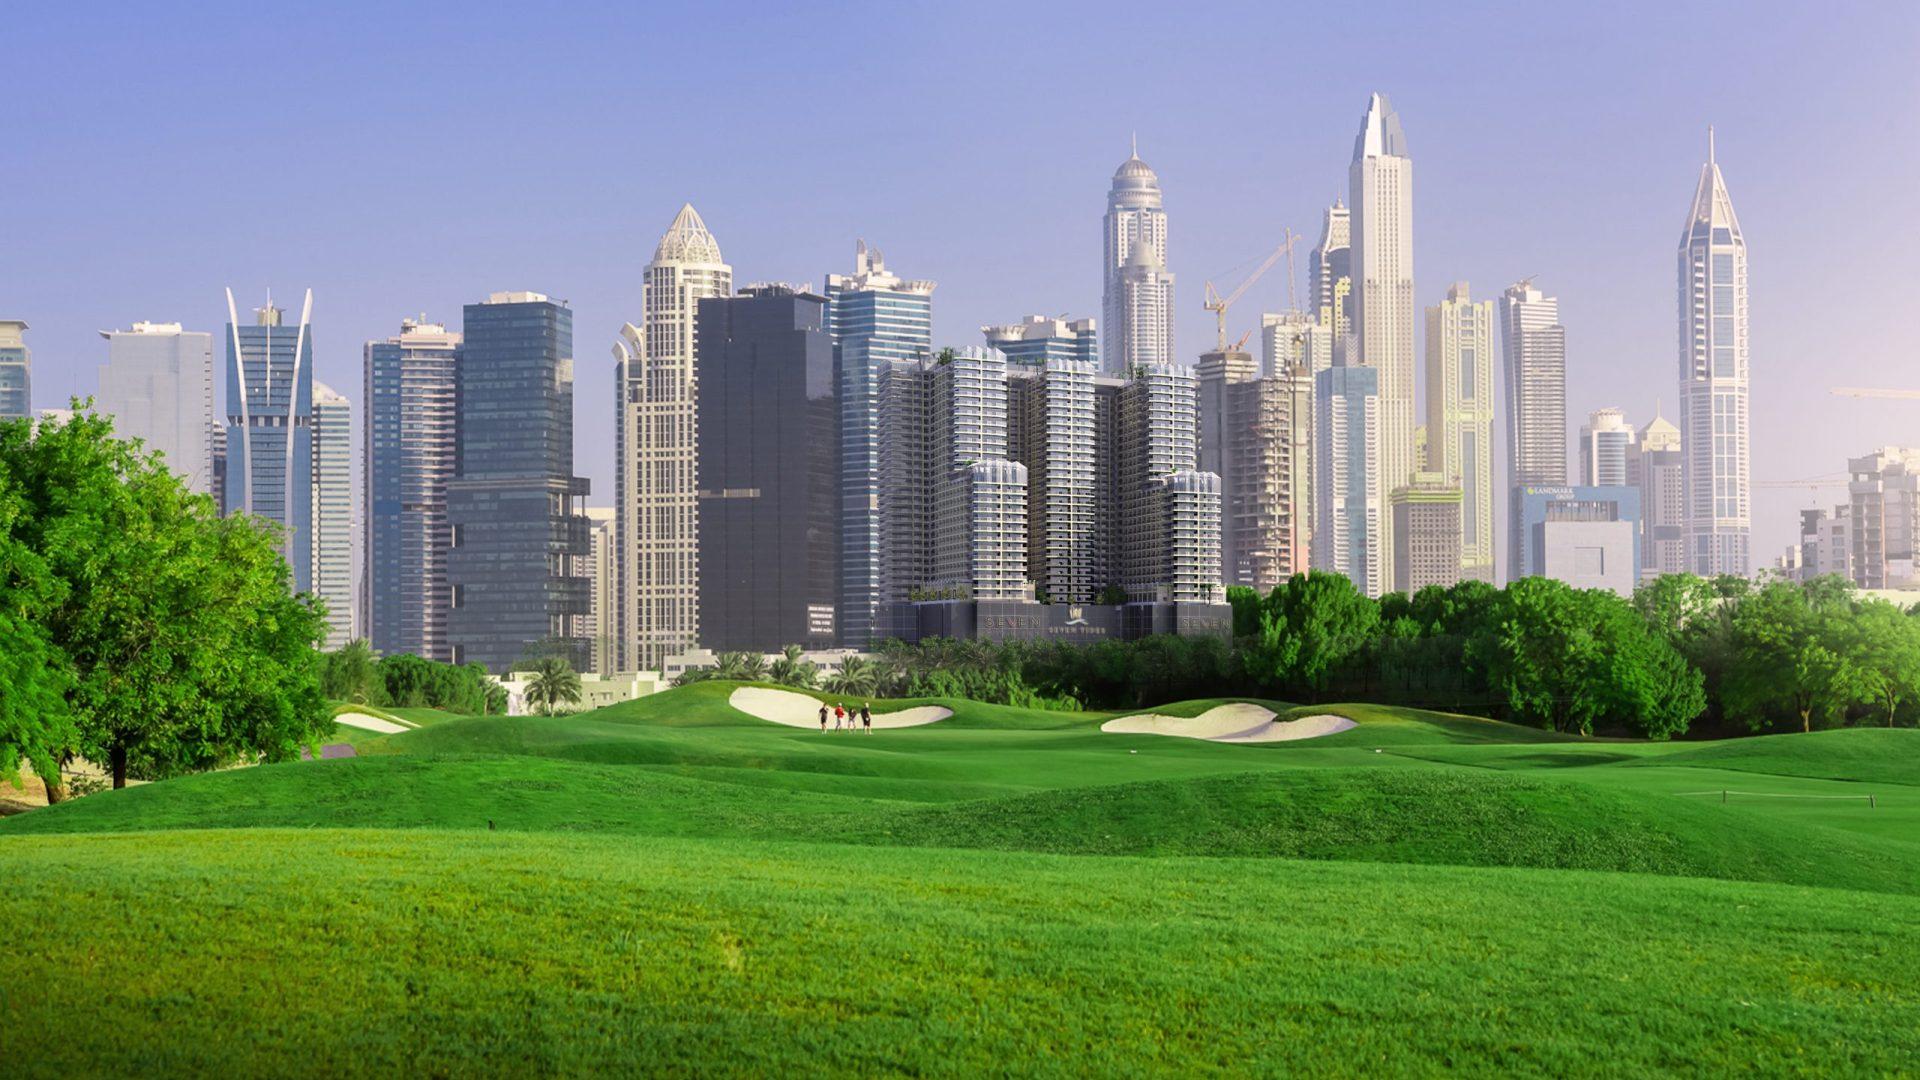 GOLF VIEWS SEVEN CITY, Jumeirah Lake Towers, Dubai, UAE – photo 9